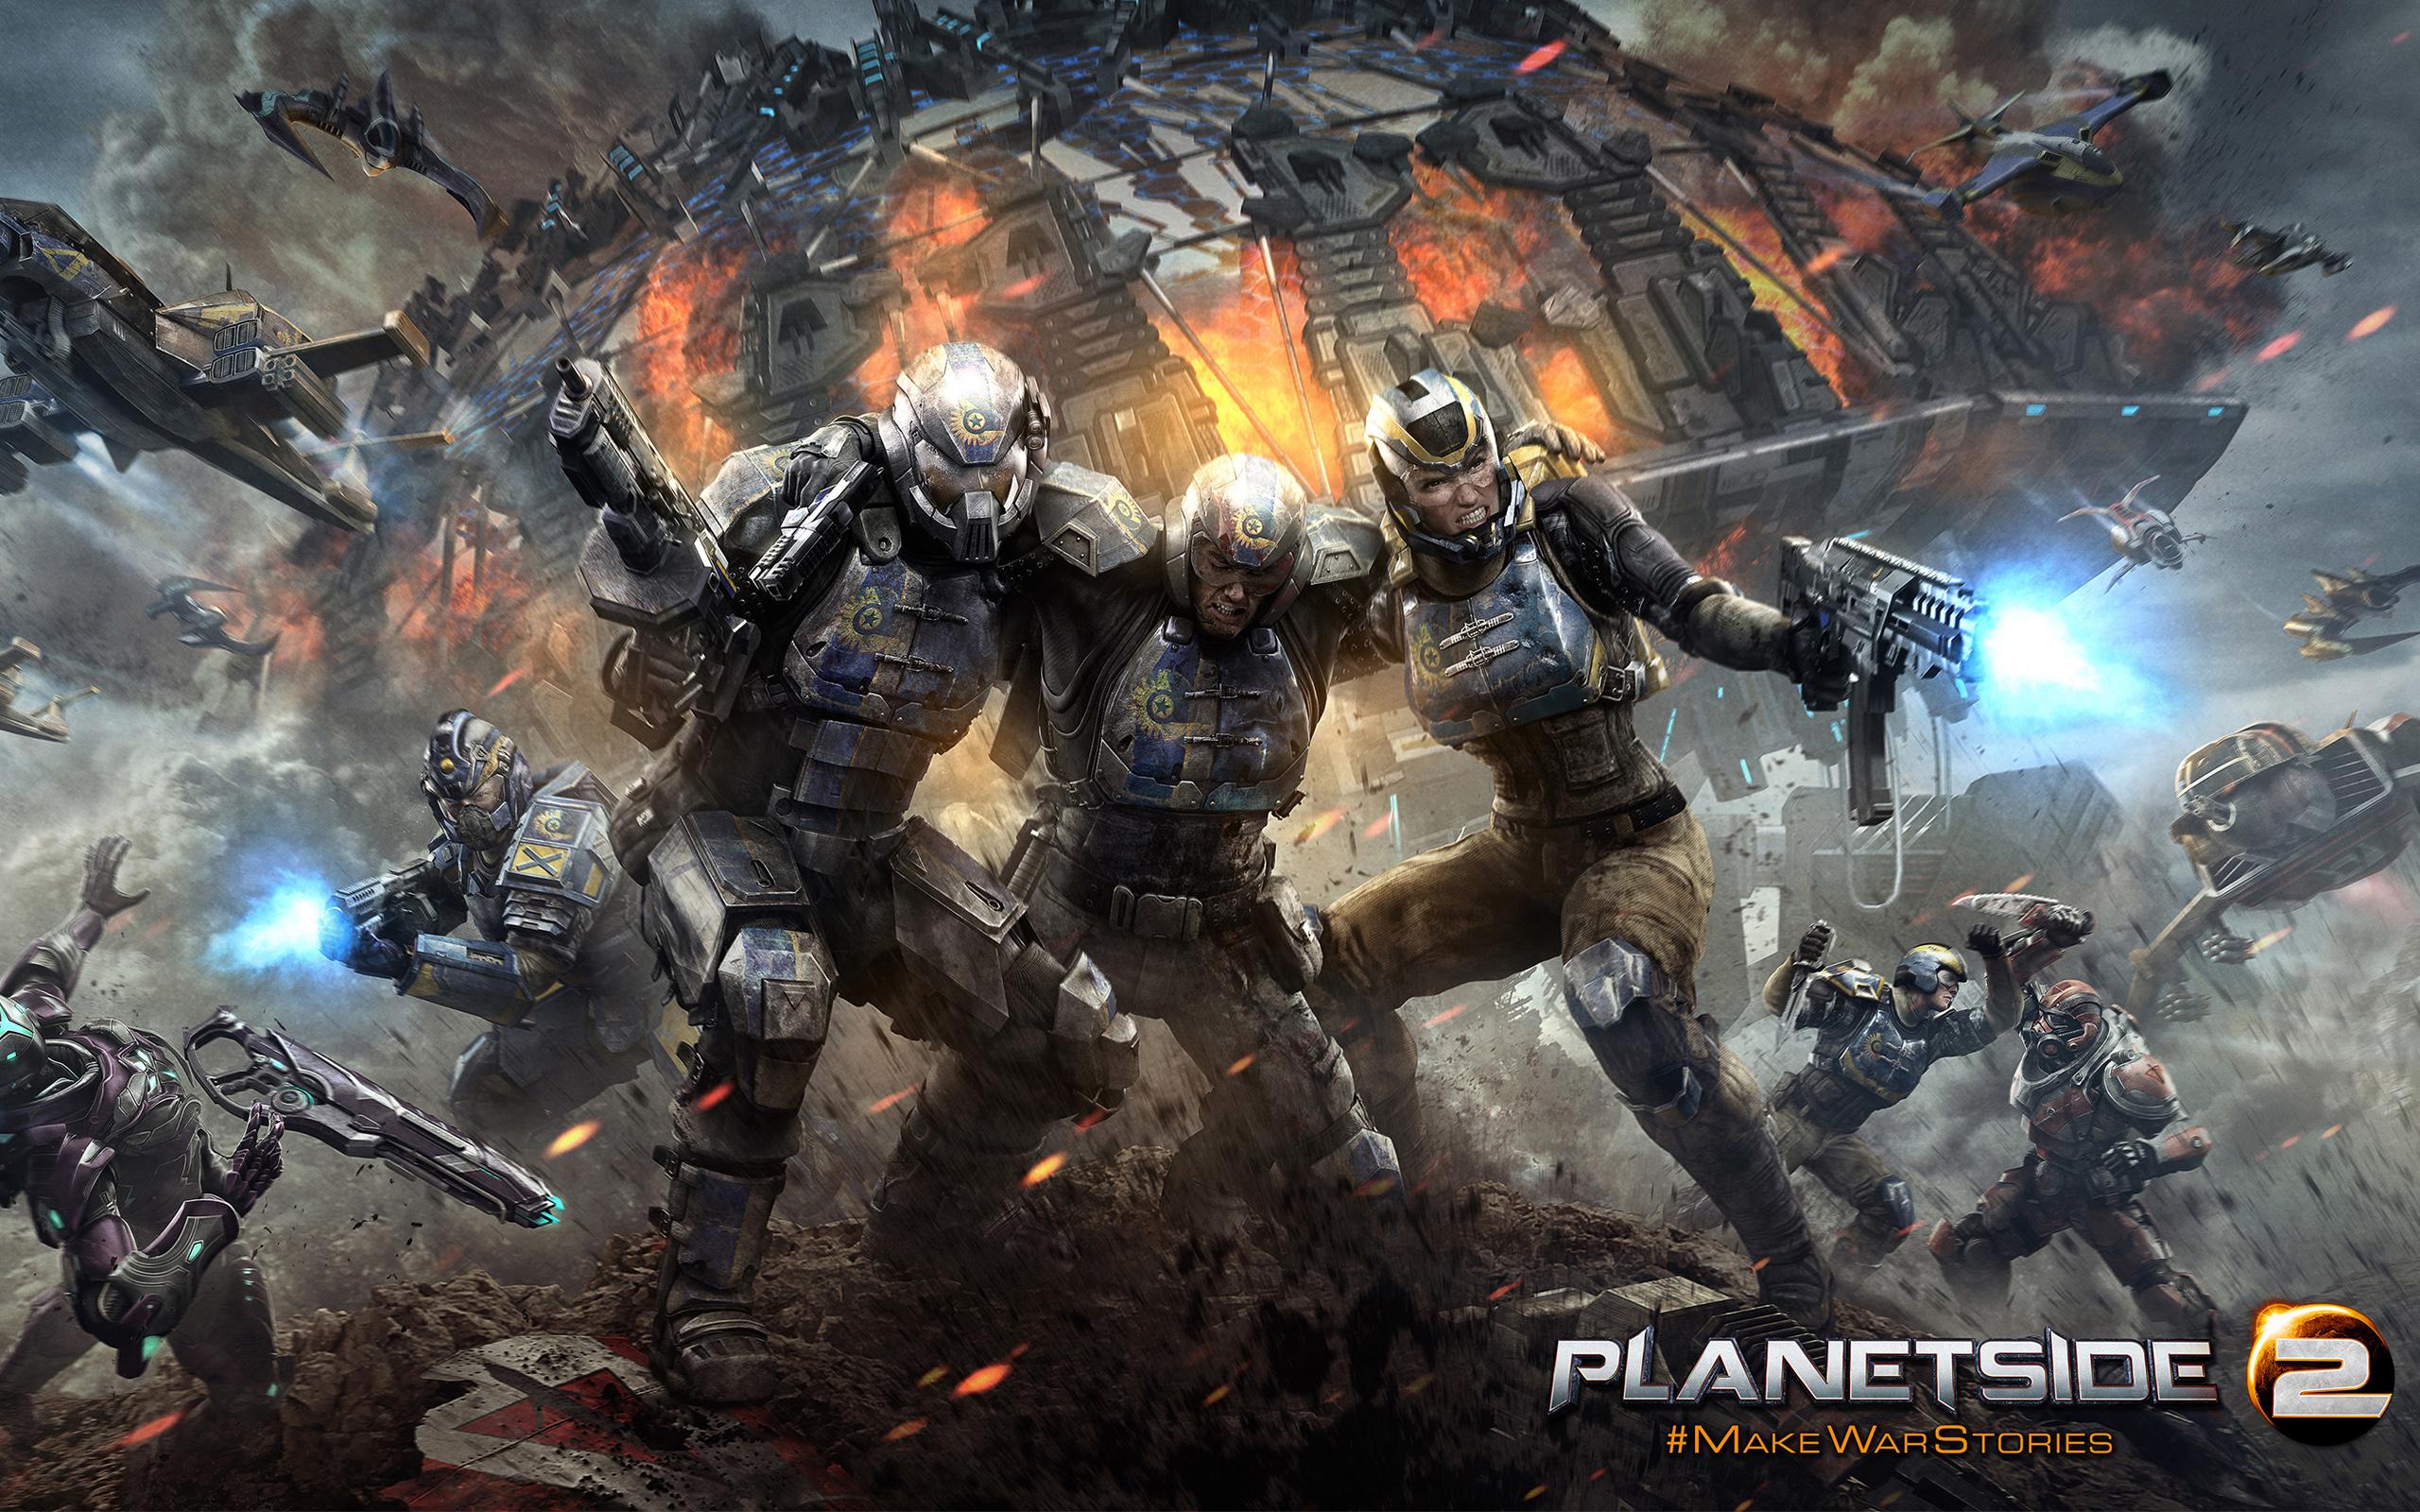 HD Wallpapers Planetside 2 PS4